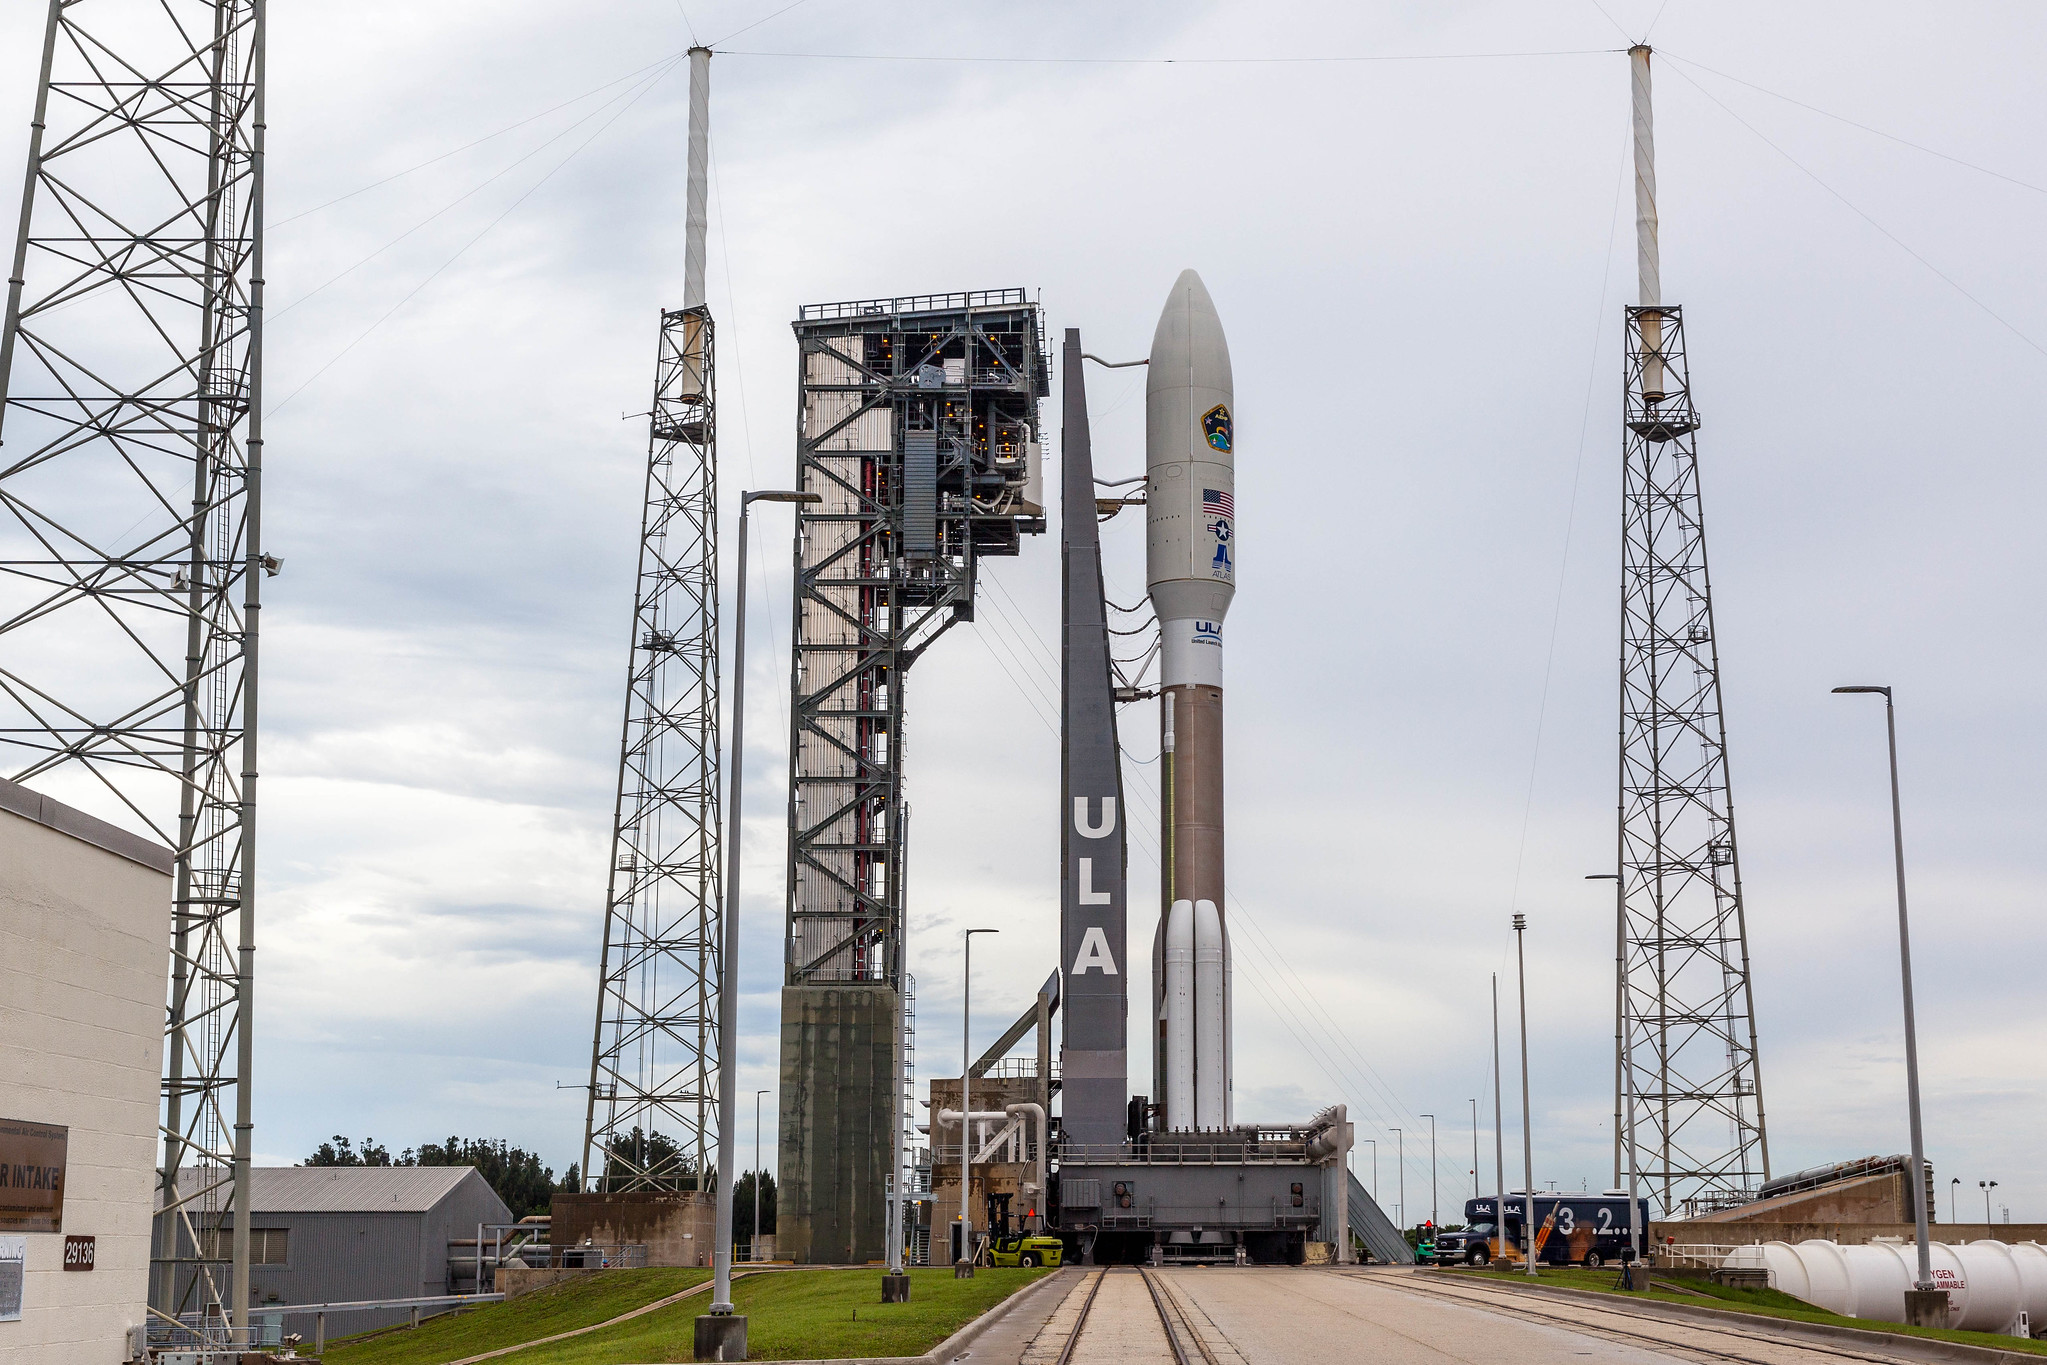 ULA Atlas V - AEHF-5